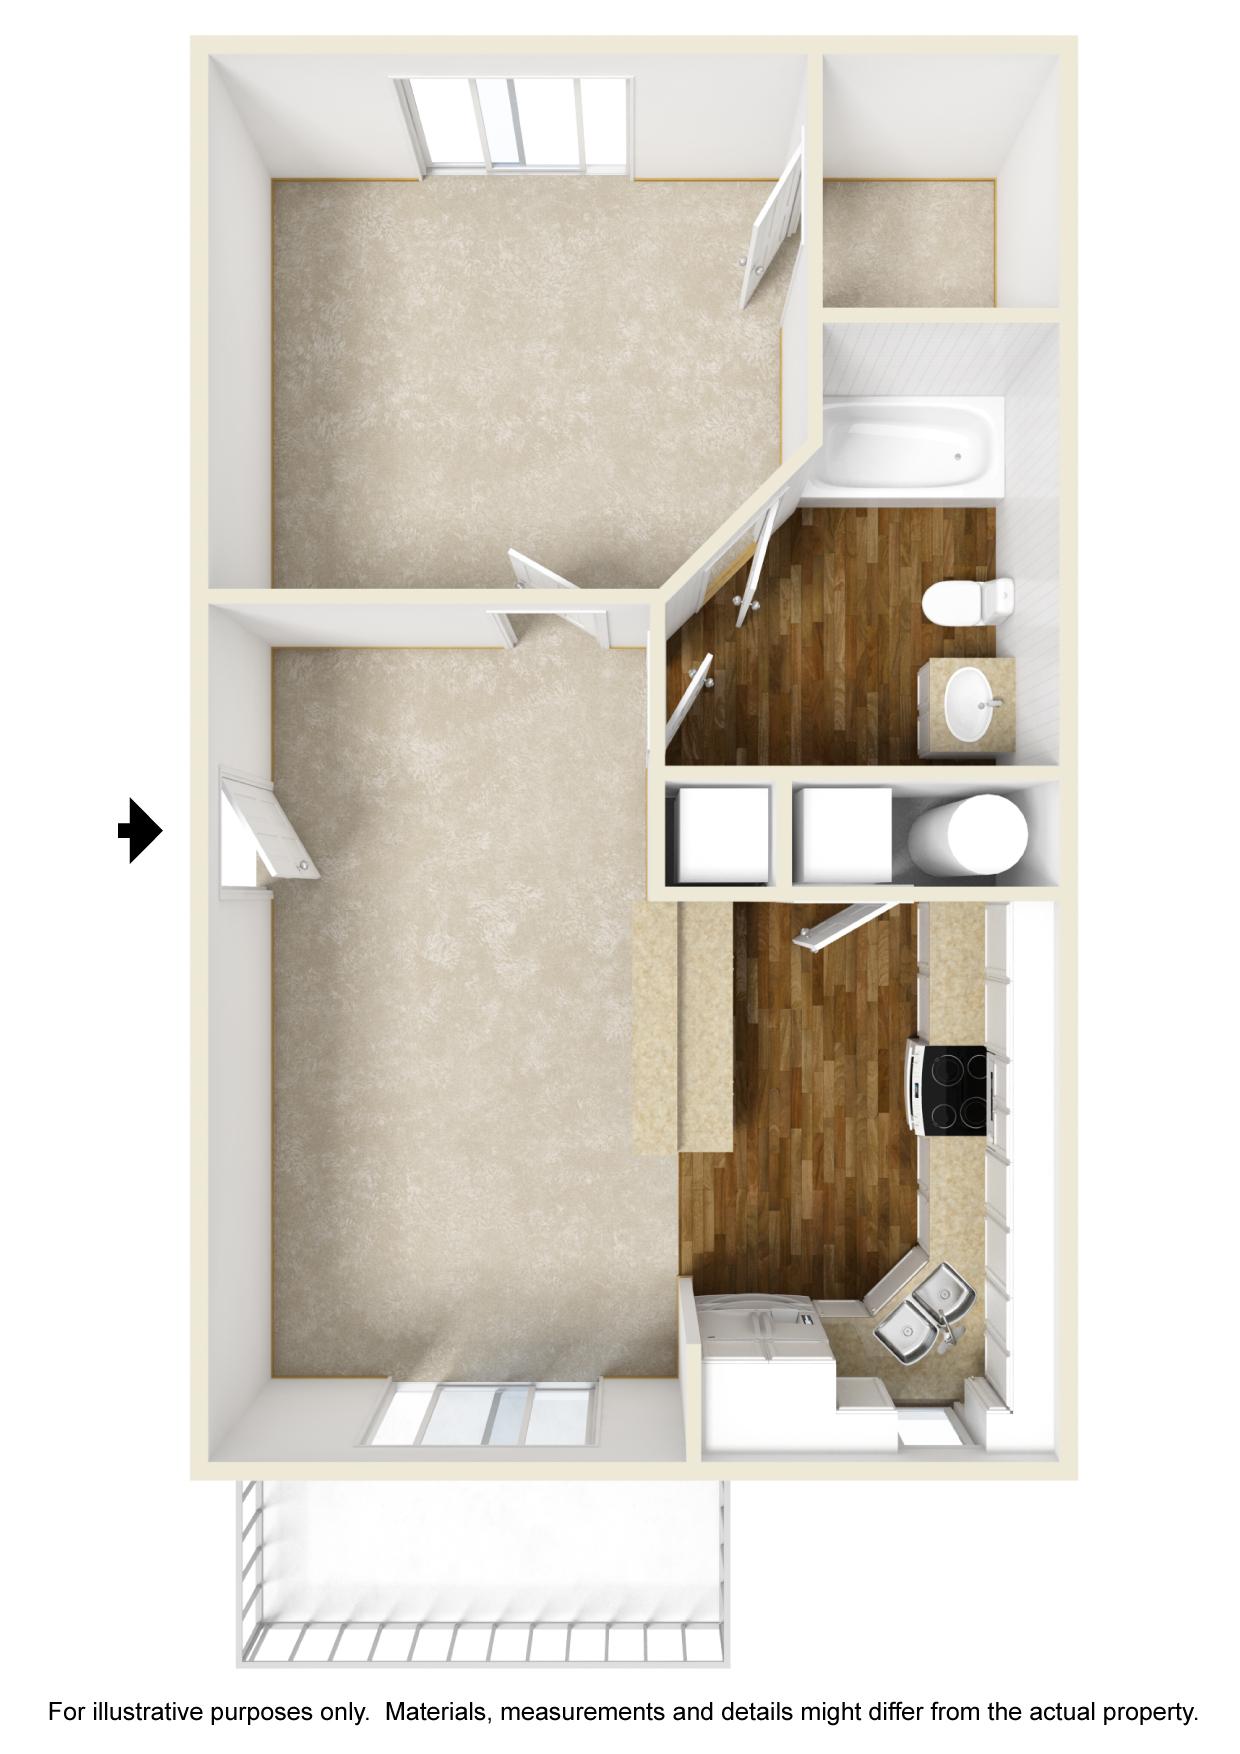 Furniture Village Atlanta ashford east village apartments, 1438 bouldercrest road, atlanta